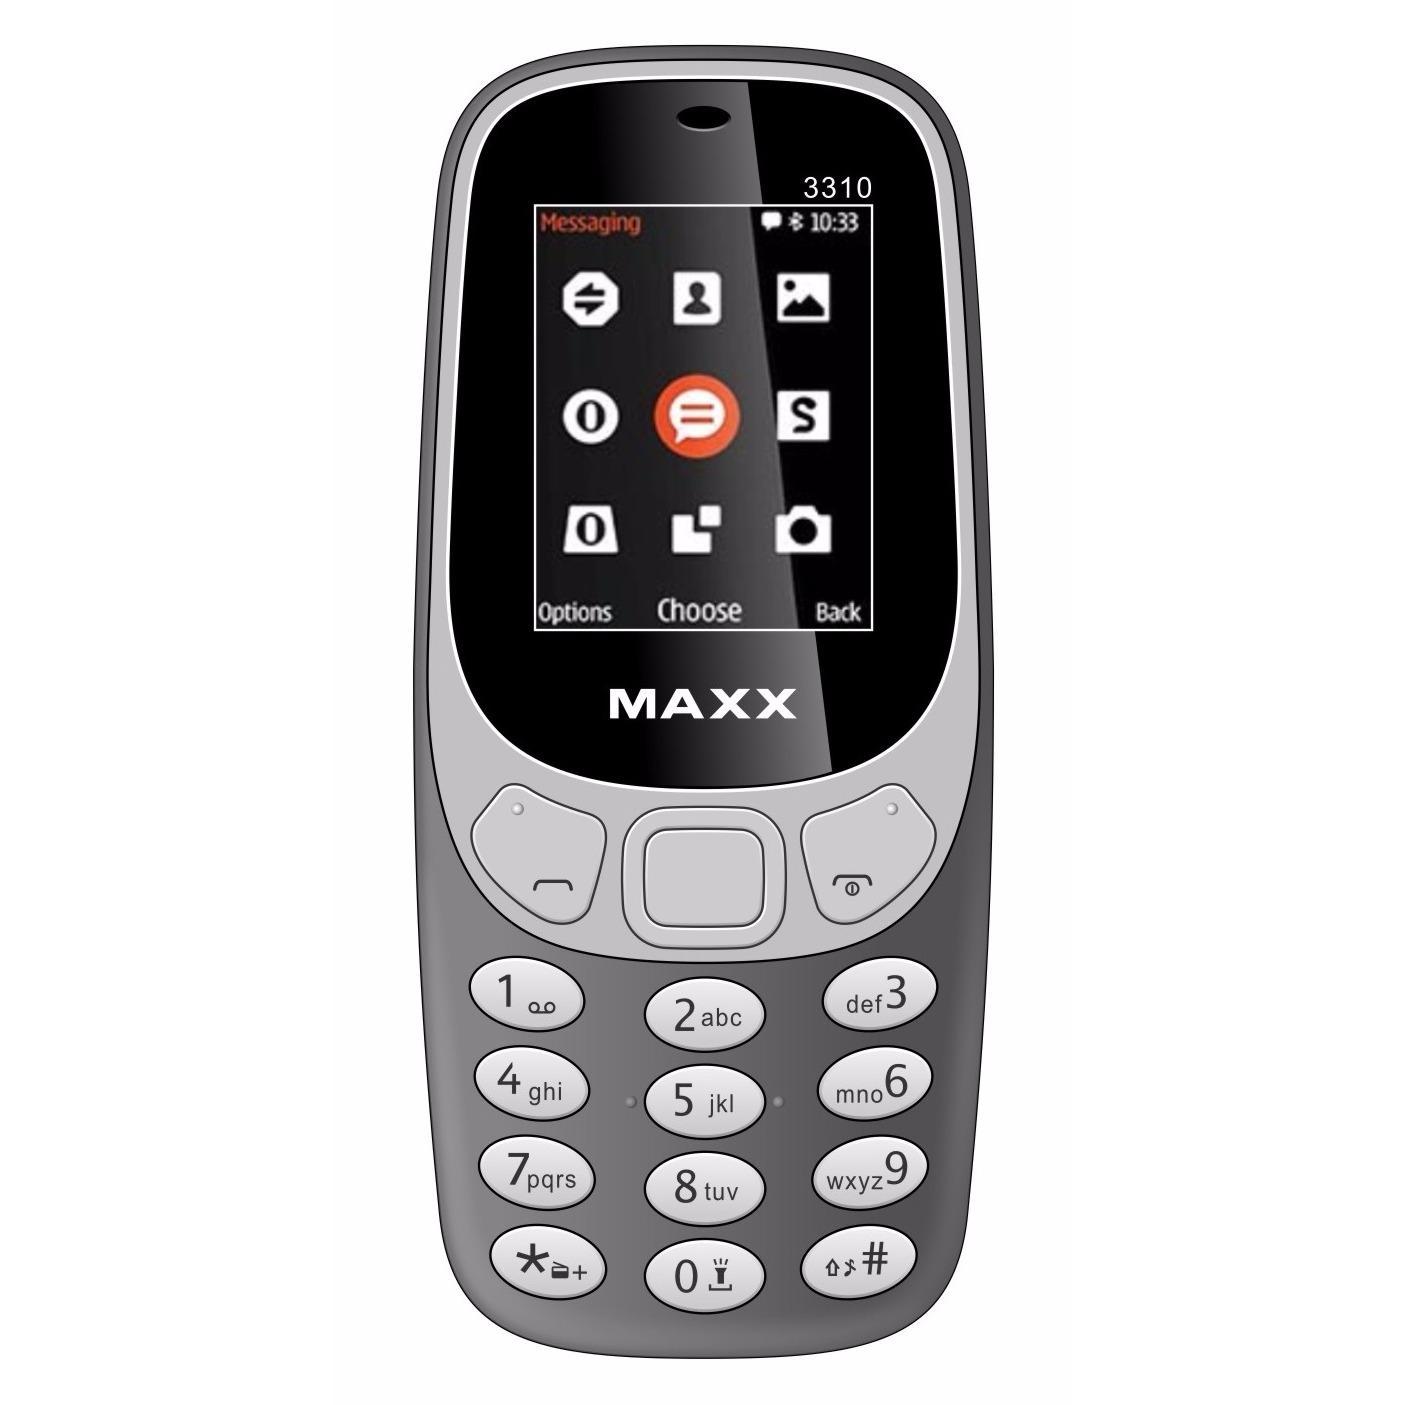 ĐTDĐ MAXX N3310 CLASSIC 2 Sim (Xám)